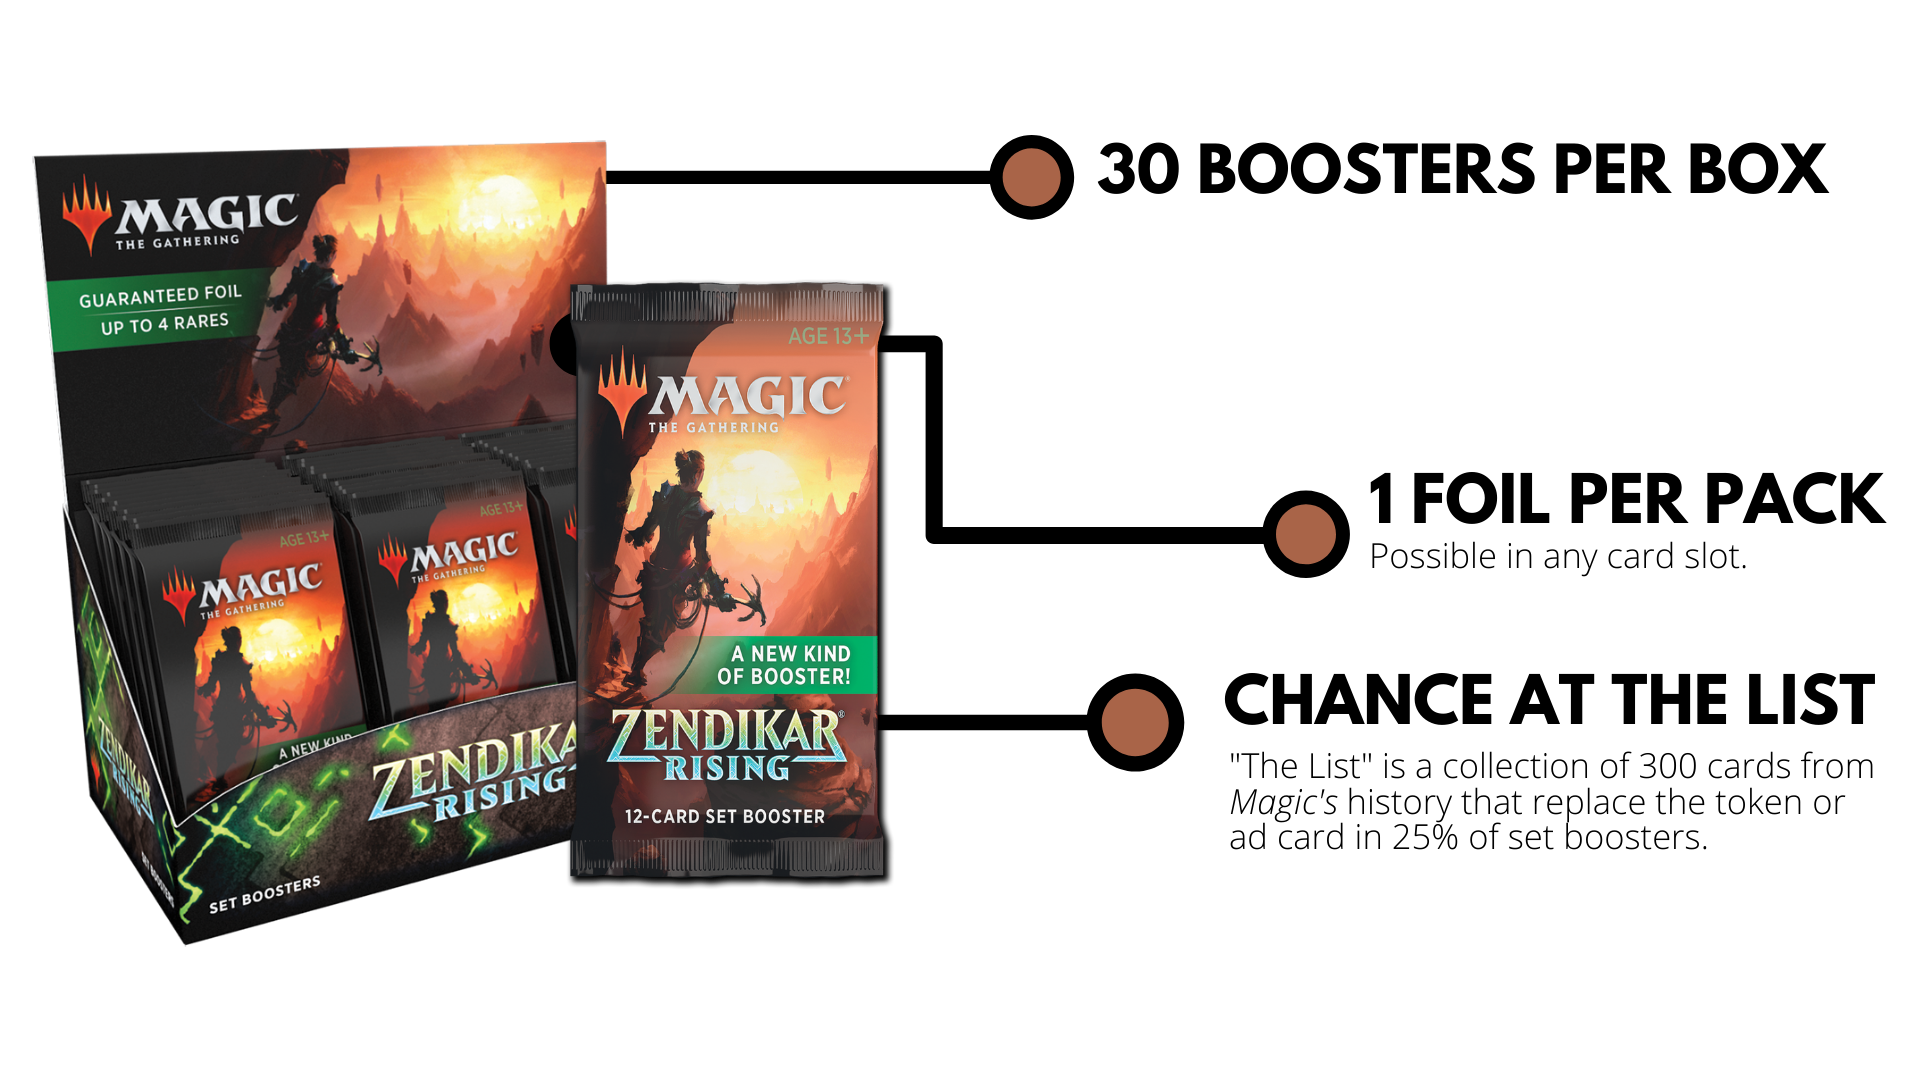 Zendikar-Rising-Pre-Order-2